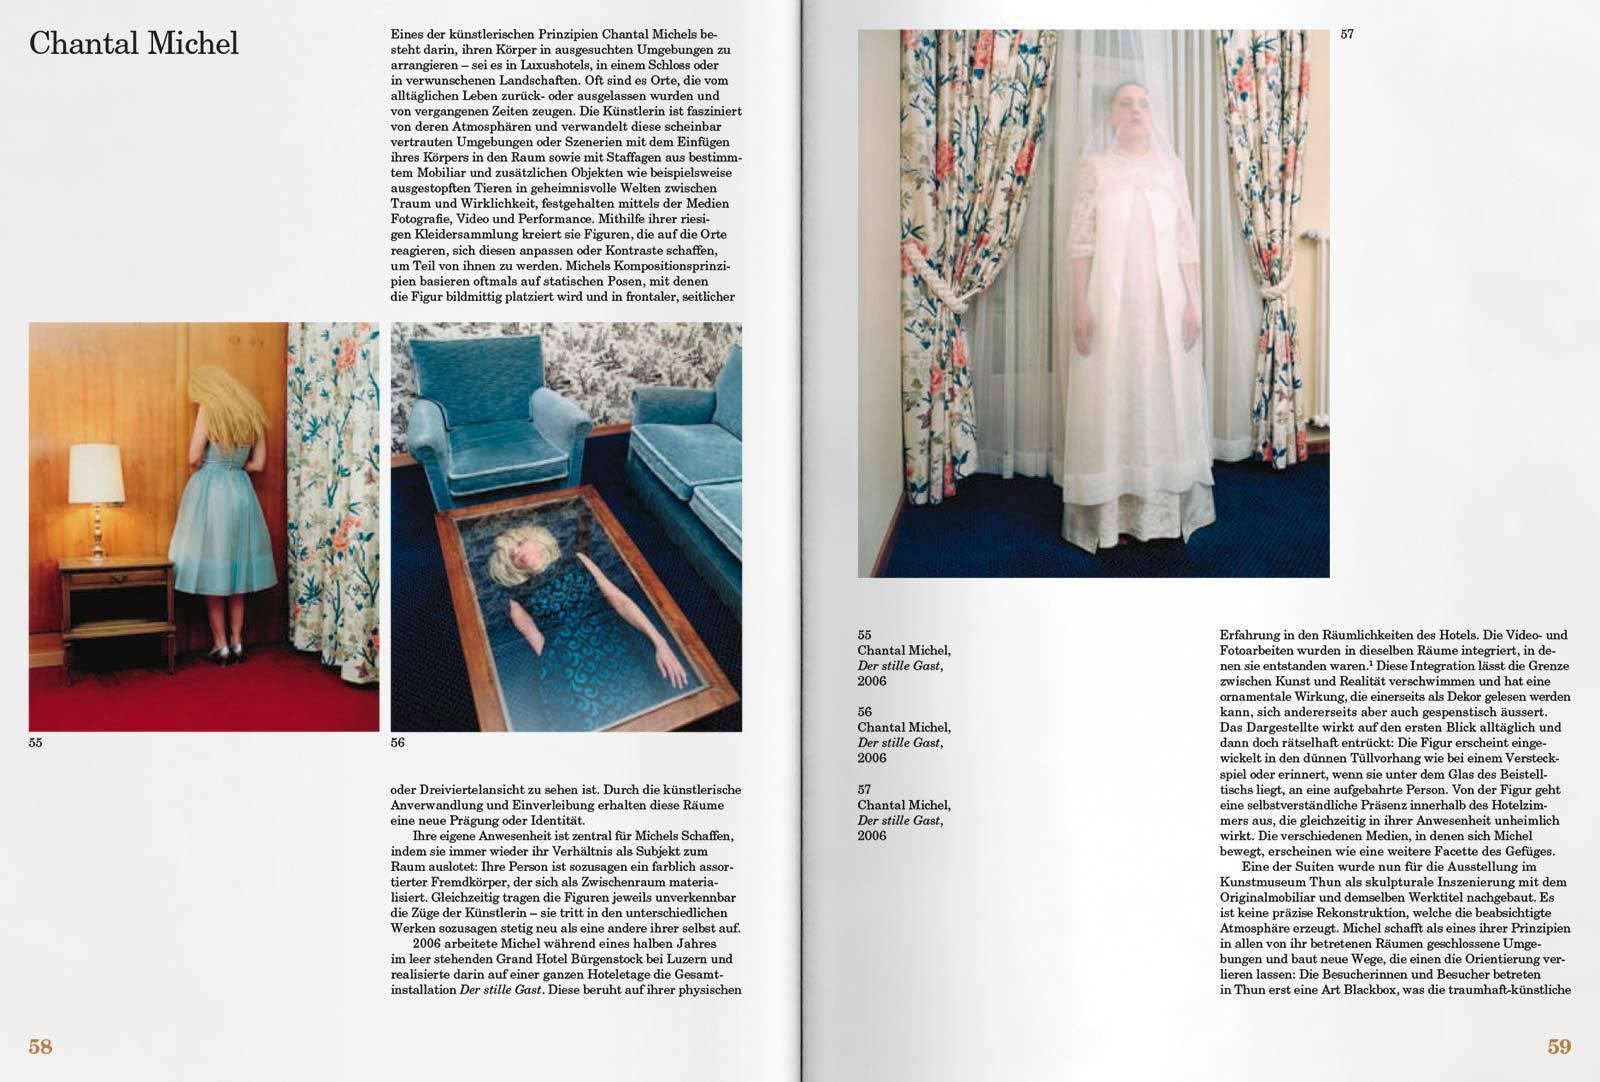 Chambres de Luxe spread06